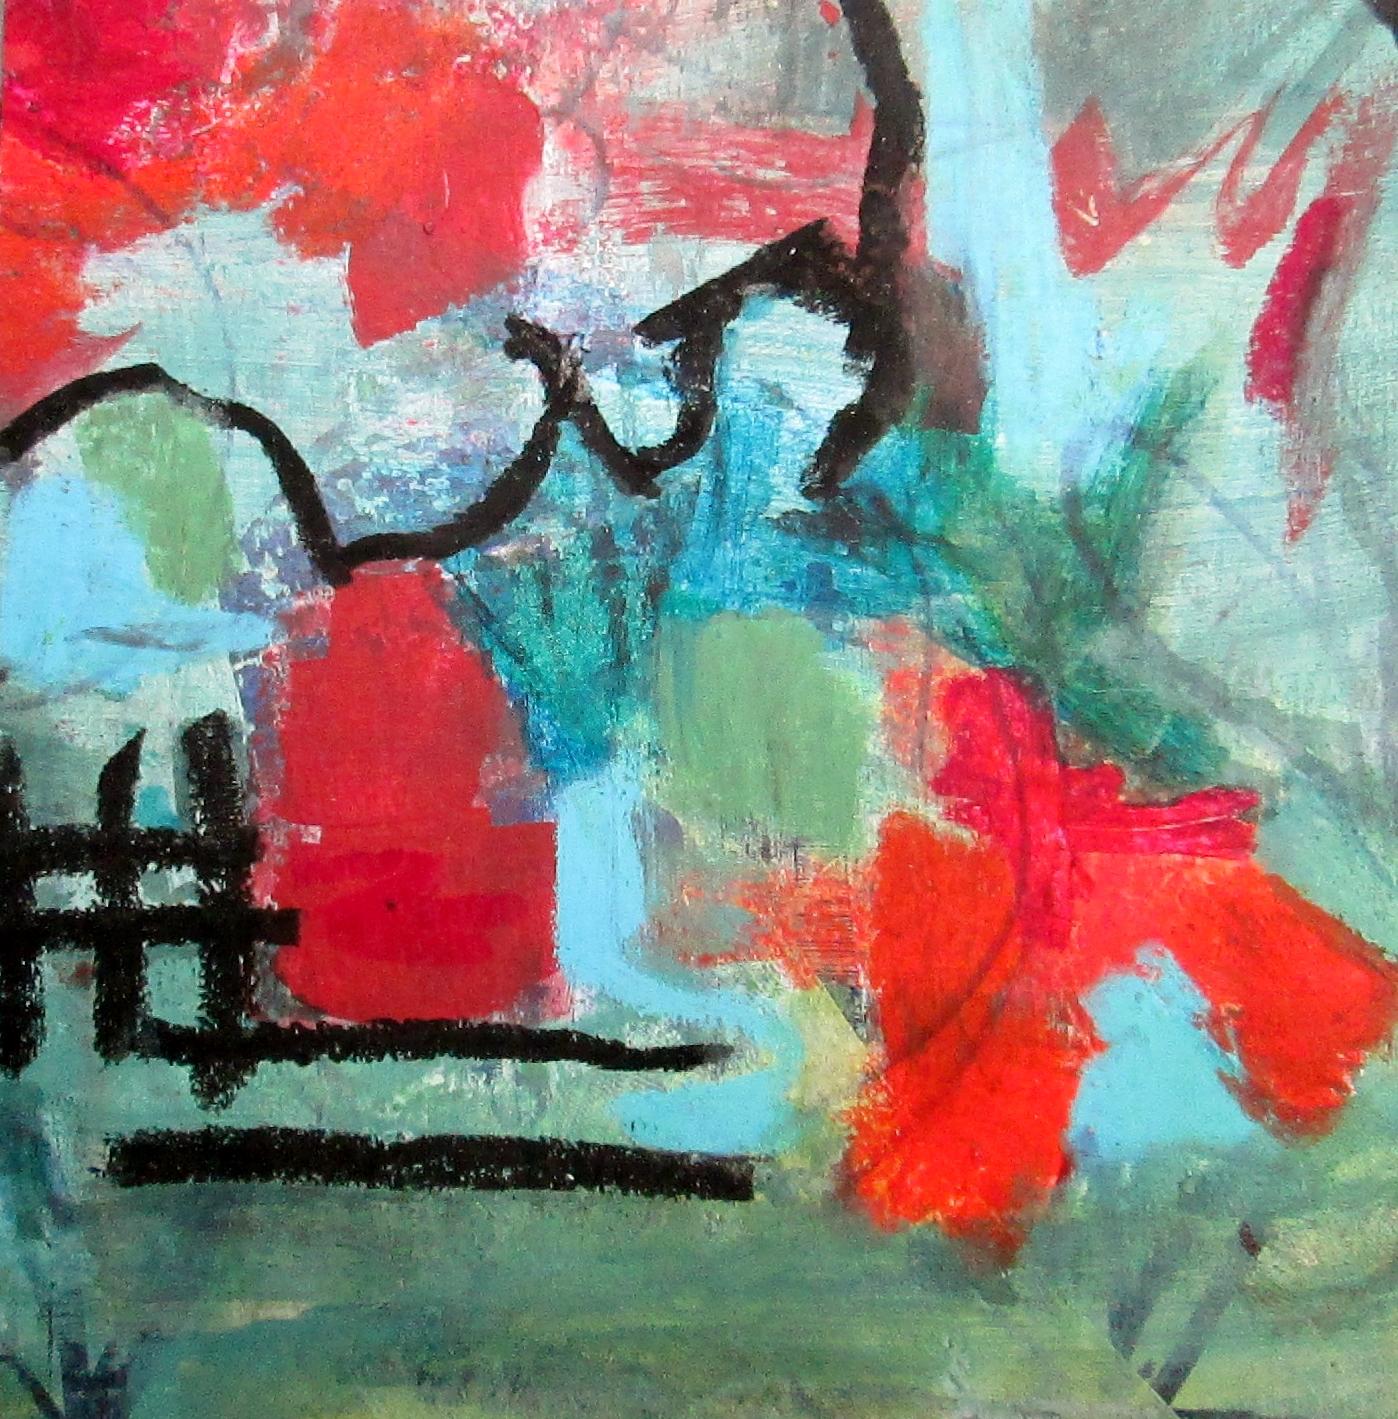 Liquitex Interference Paint Joyful Ploys